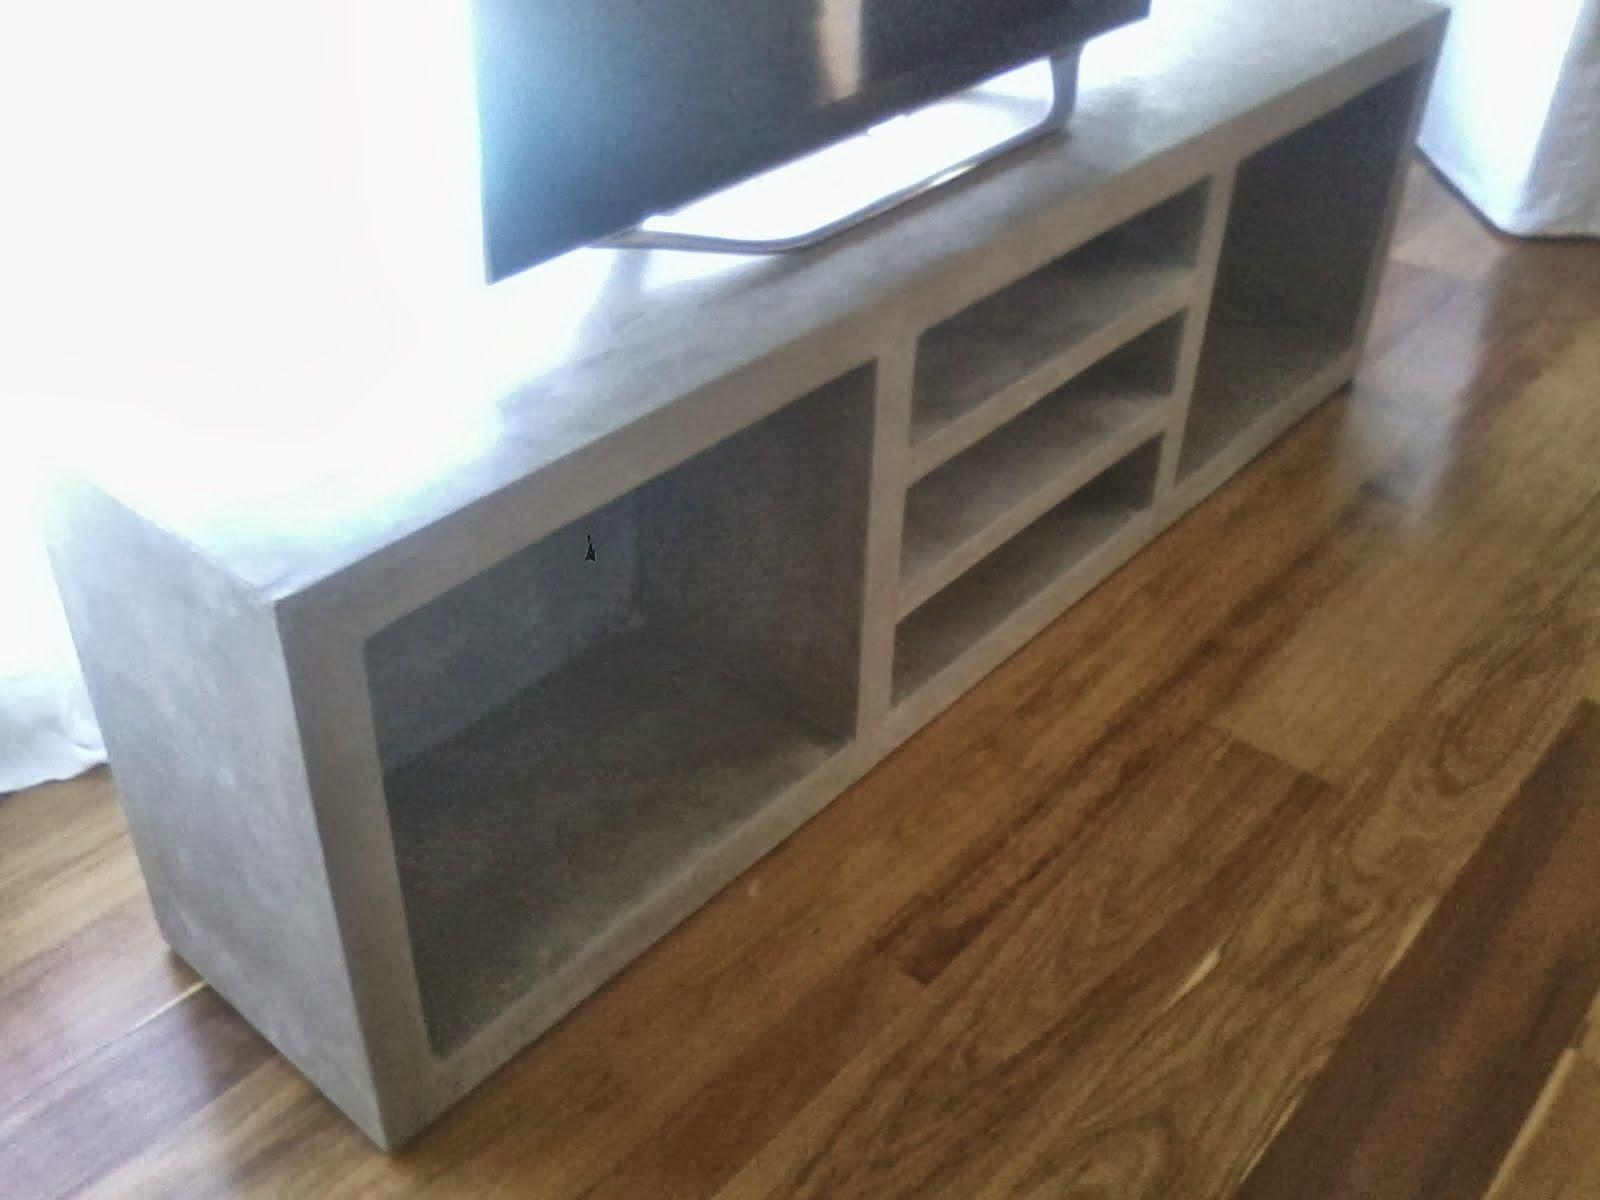 Muebles En Cemento Light Estilo Ribera Repisa De Cemento  # Muebles Cemento Liviano